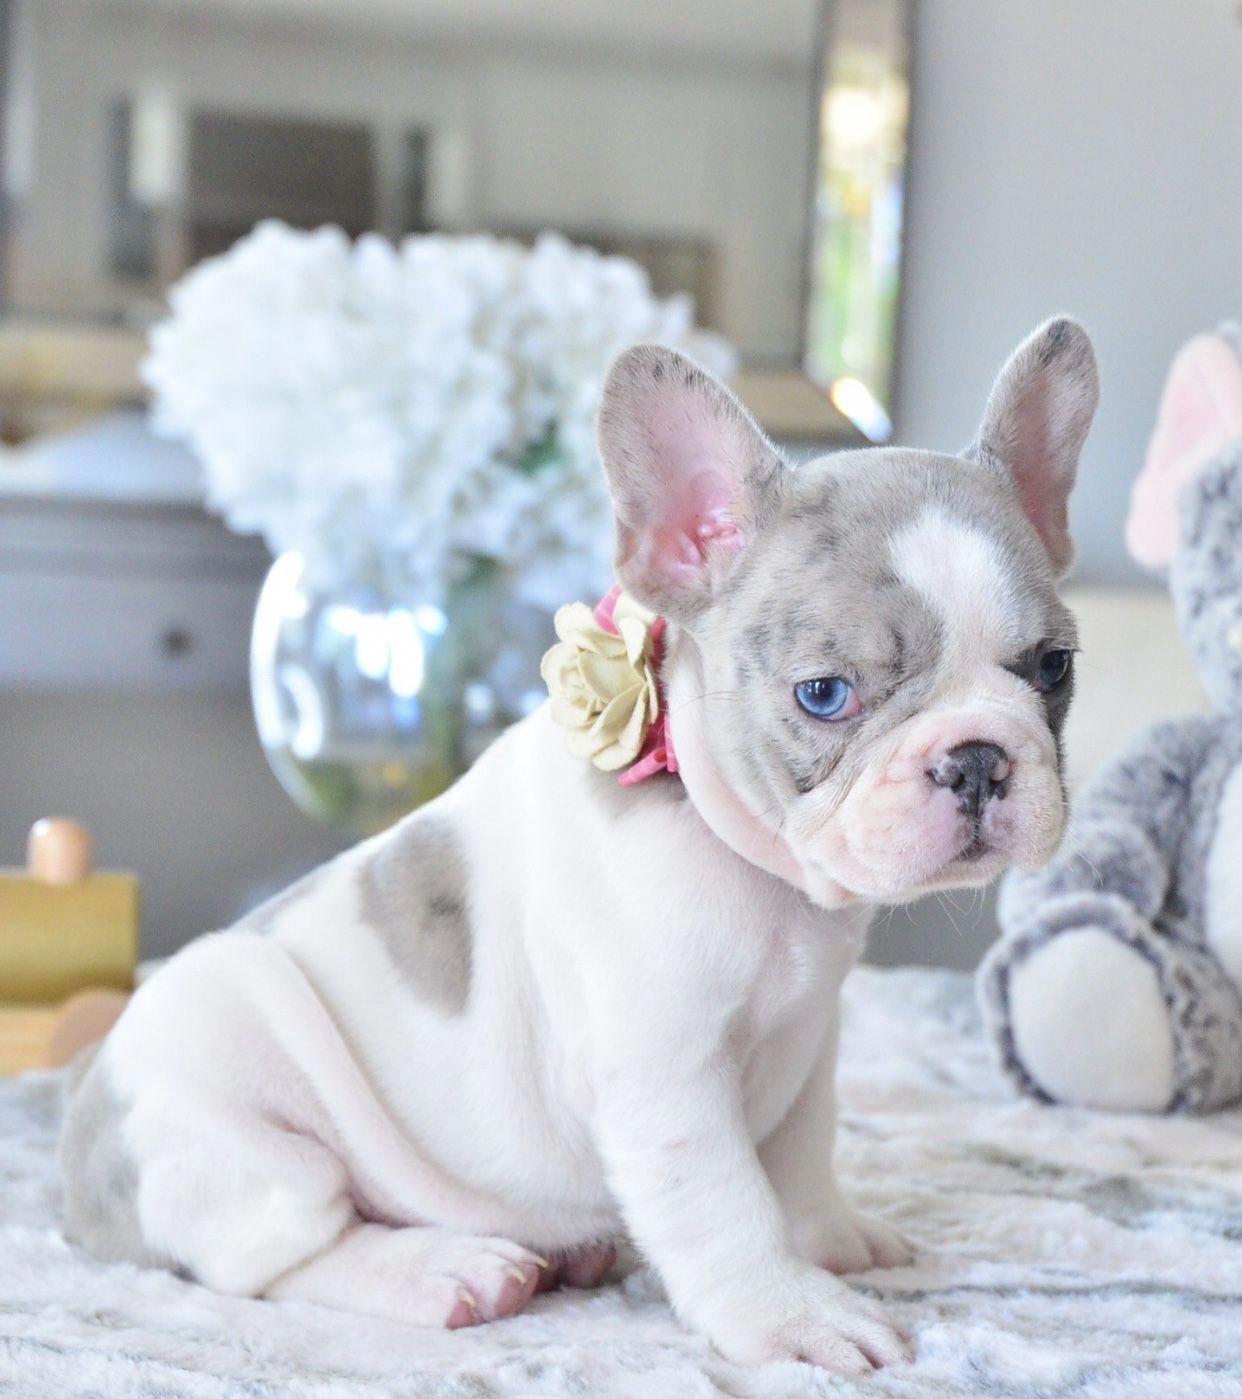 French Bulldog Full Grown Frenchbulldogfullgrown In 2020 French Bulldog Puppies Cute Dogs And Puppies Bulldog Puppies